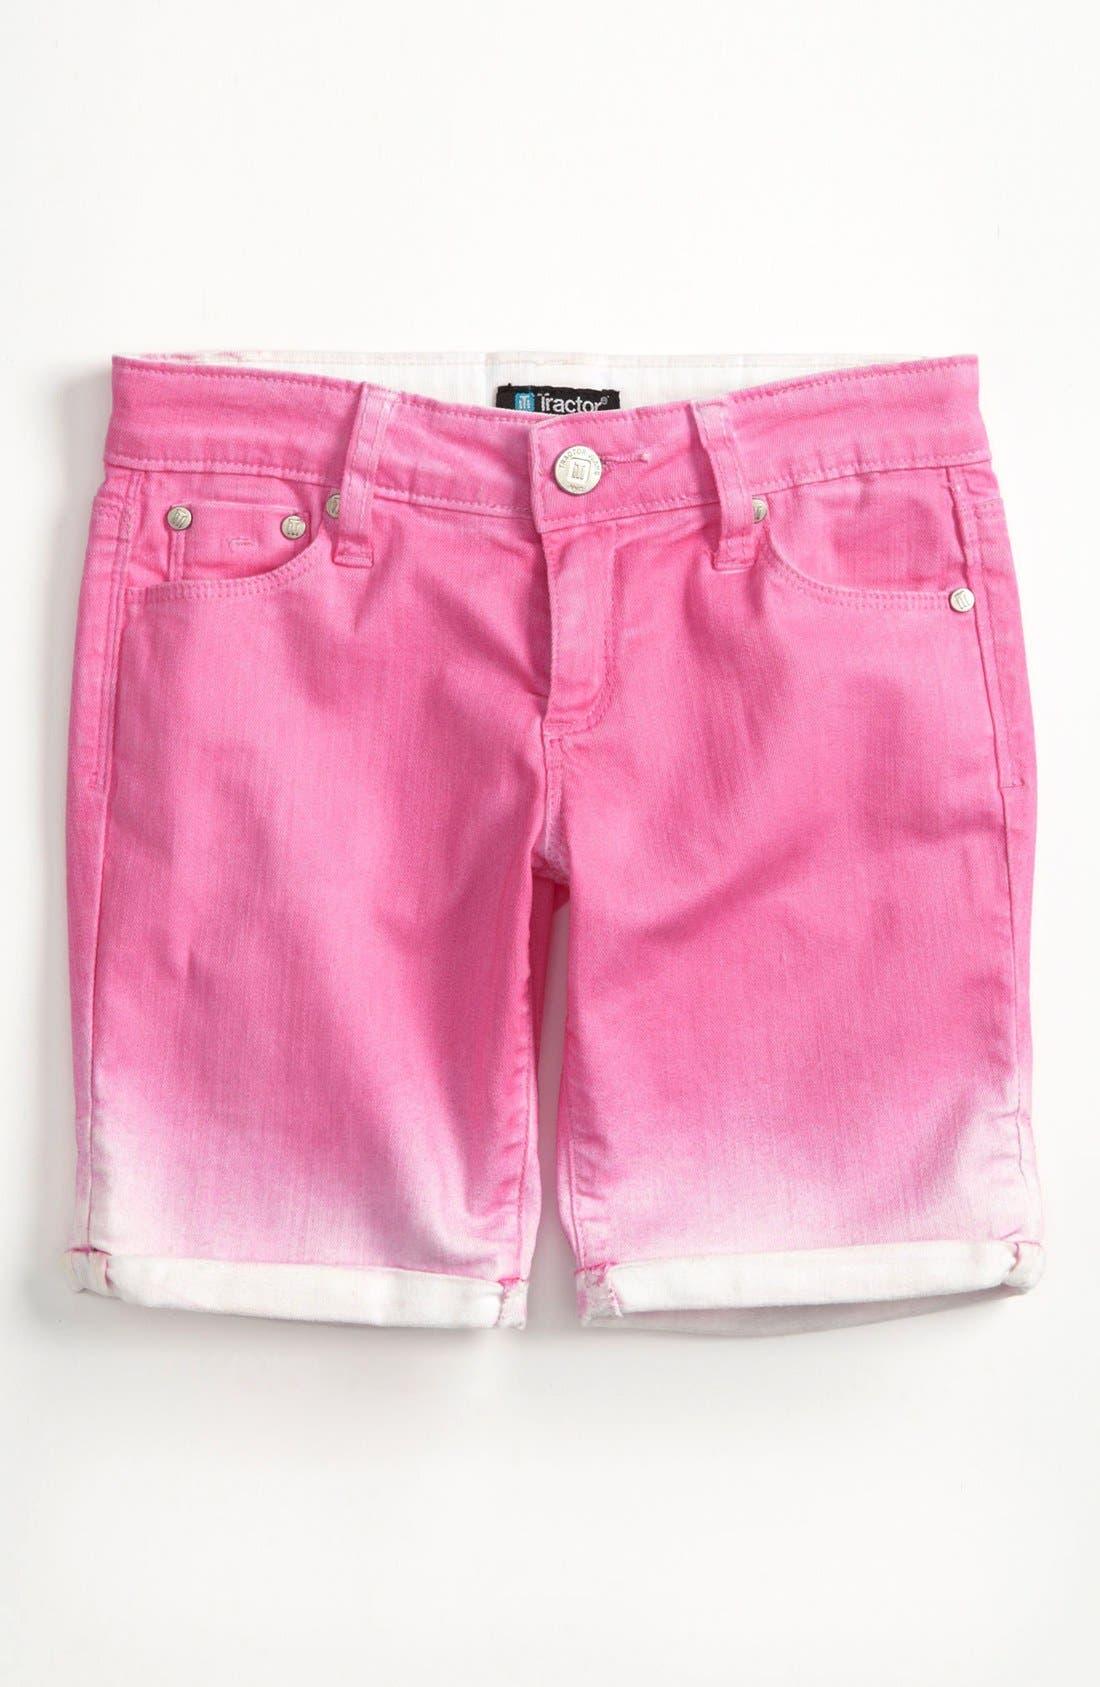 Main Image - Tractr Ombré Bermuda Shorts (Big Girls)